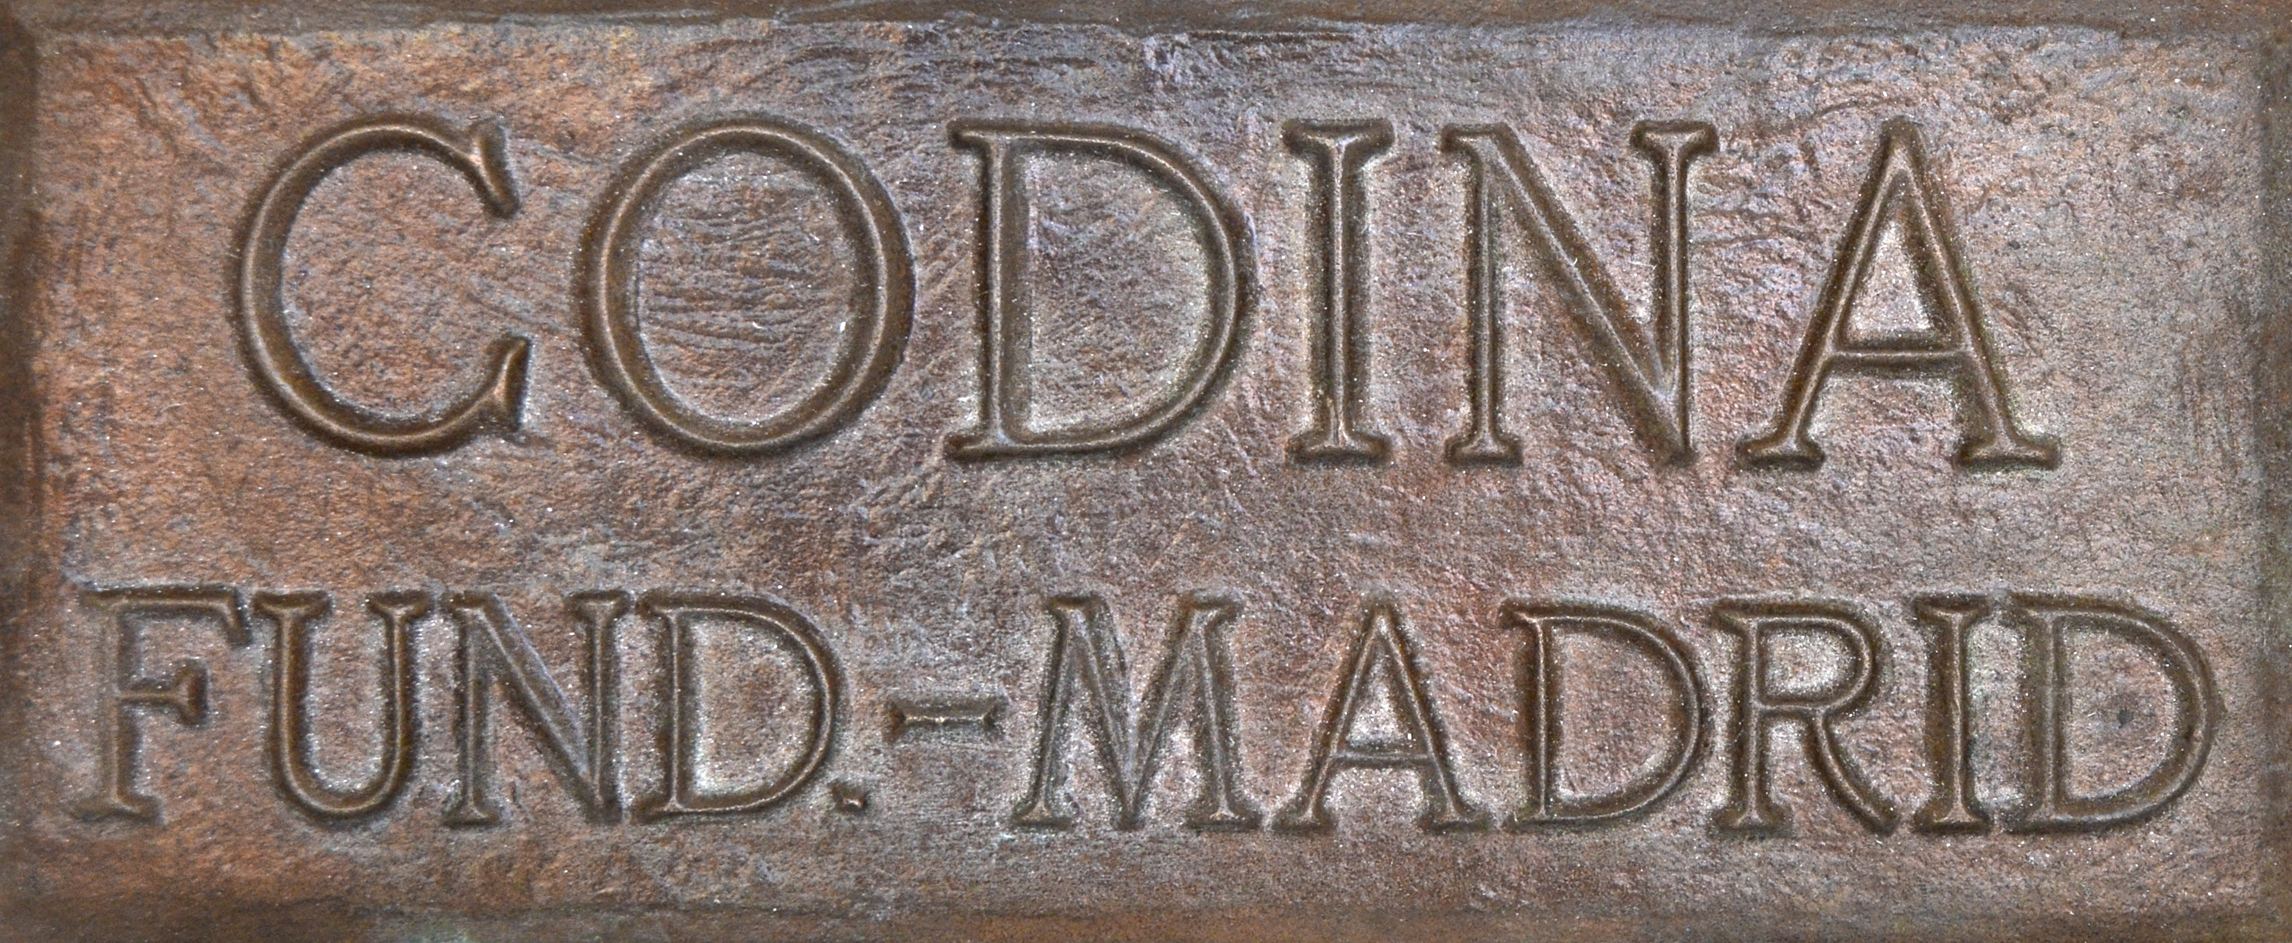 sello Codina